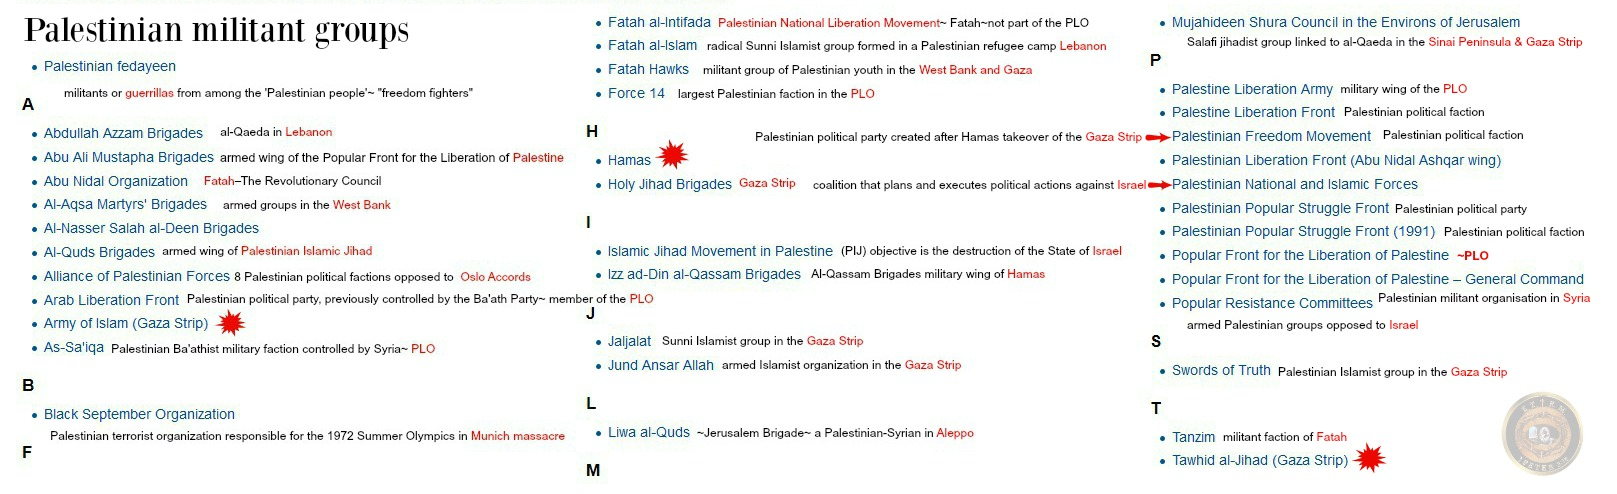 palistinian militant groups